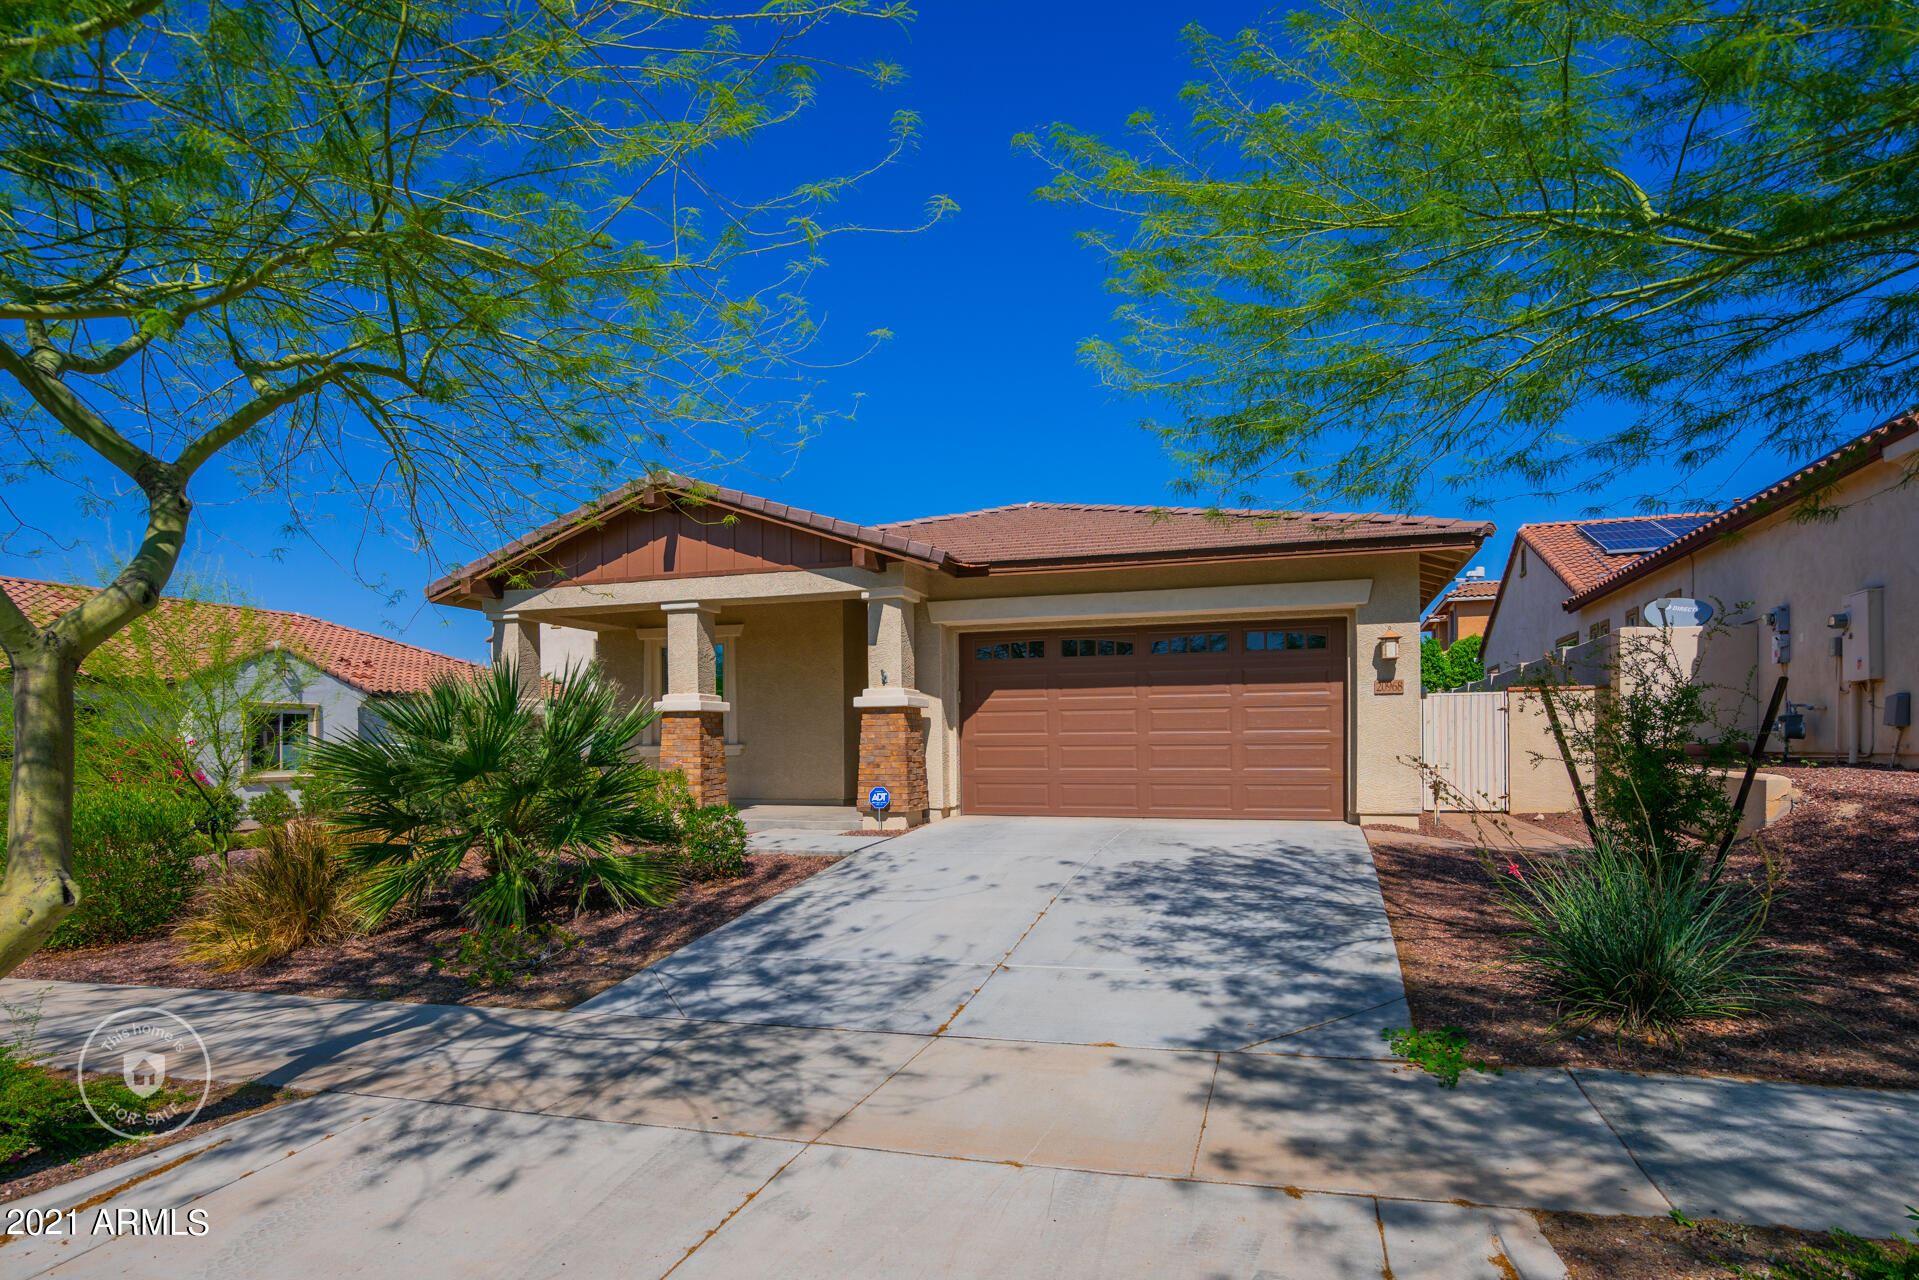 Photo of 20968 W THOMAS Road, Buckeye, AZ 85396 (MLS # 6296349)